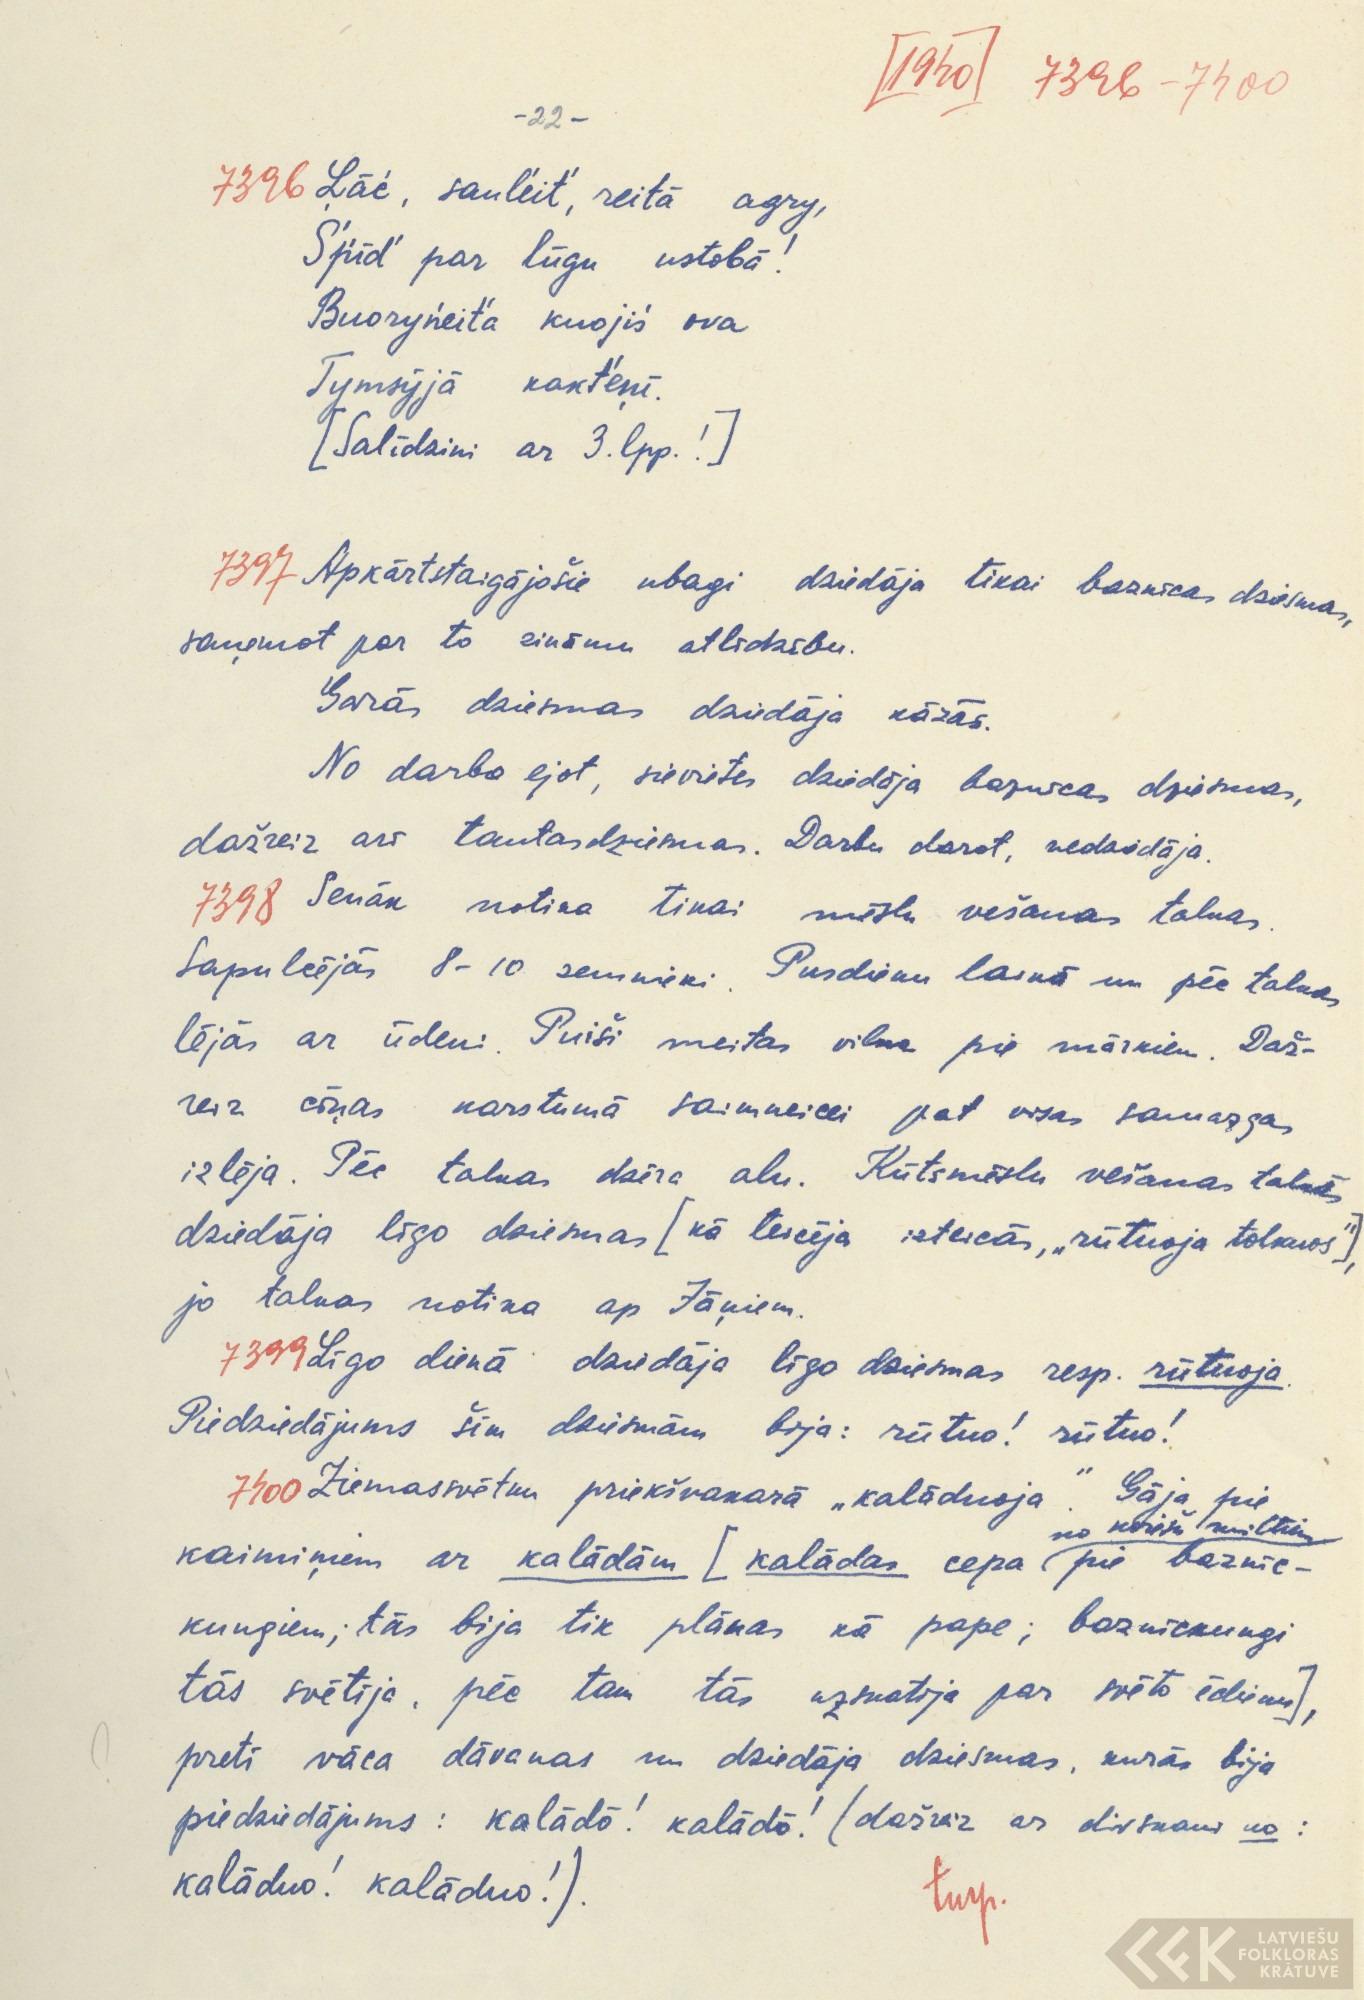 1940-12-zinatniska-ekspedicija-19-0022